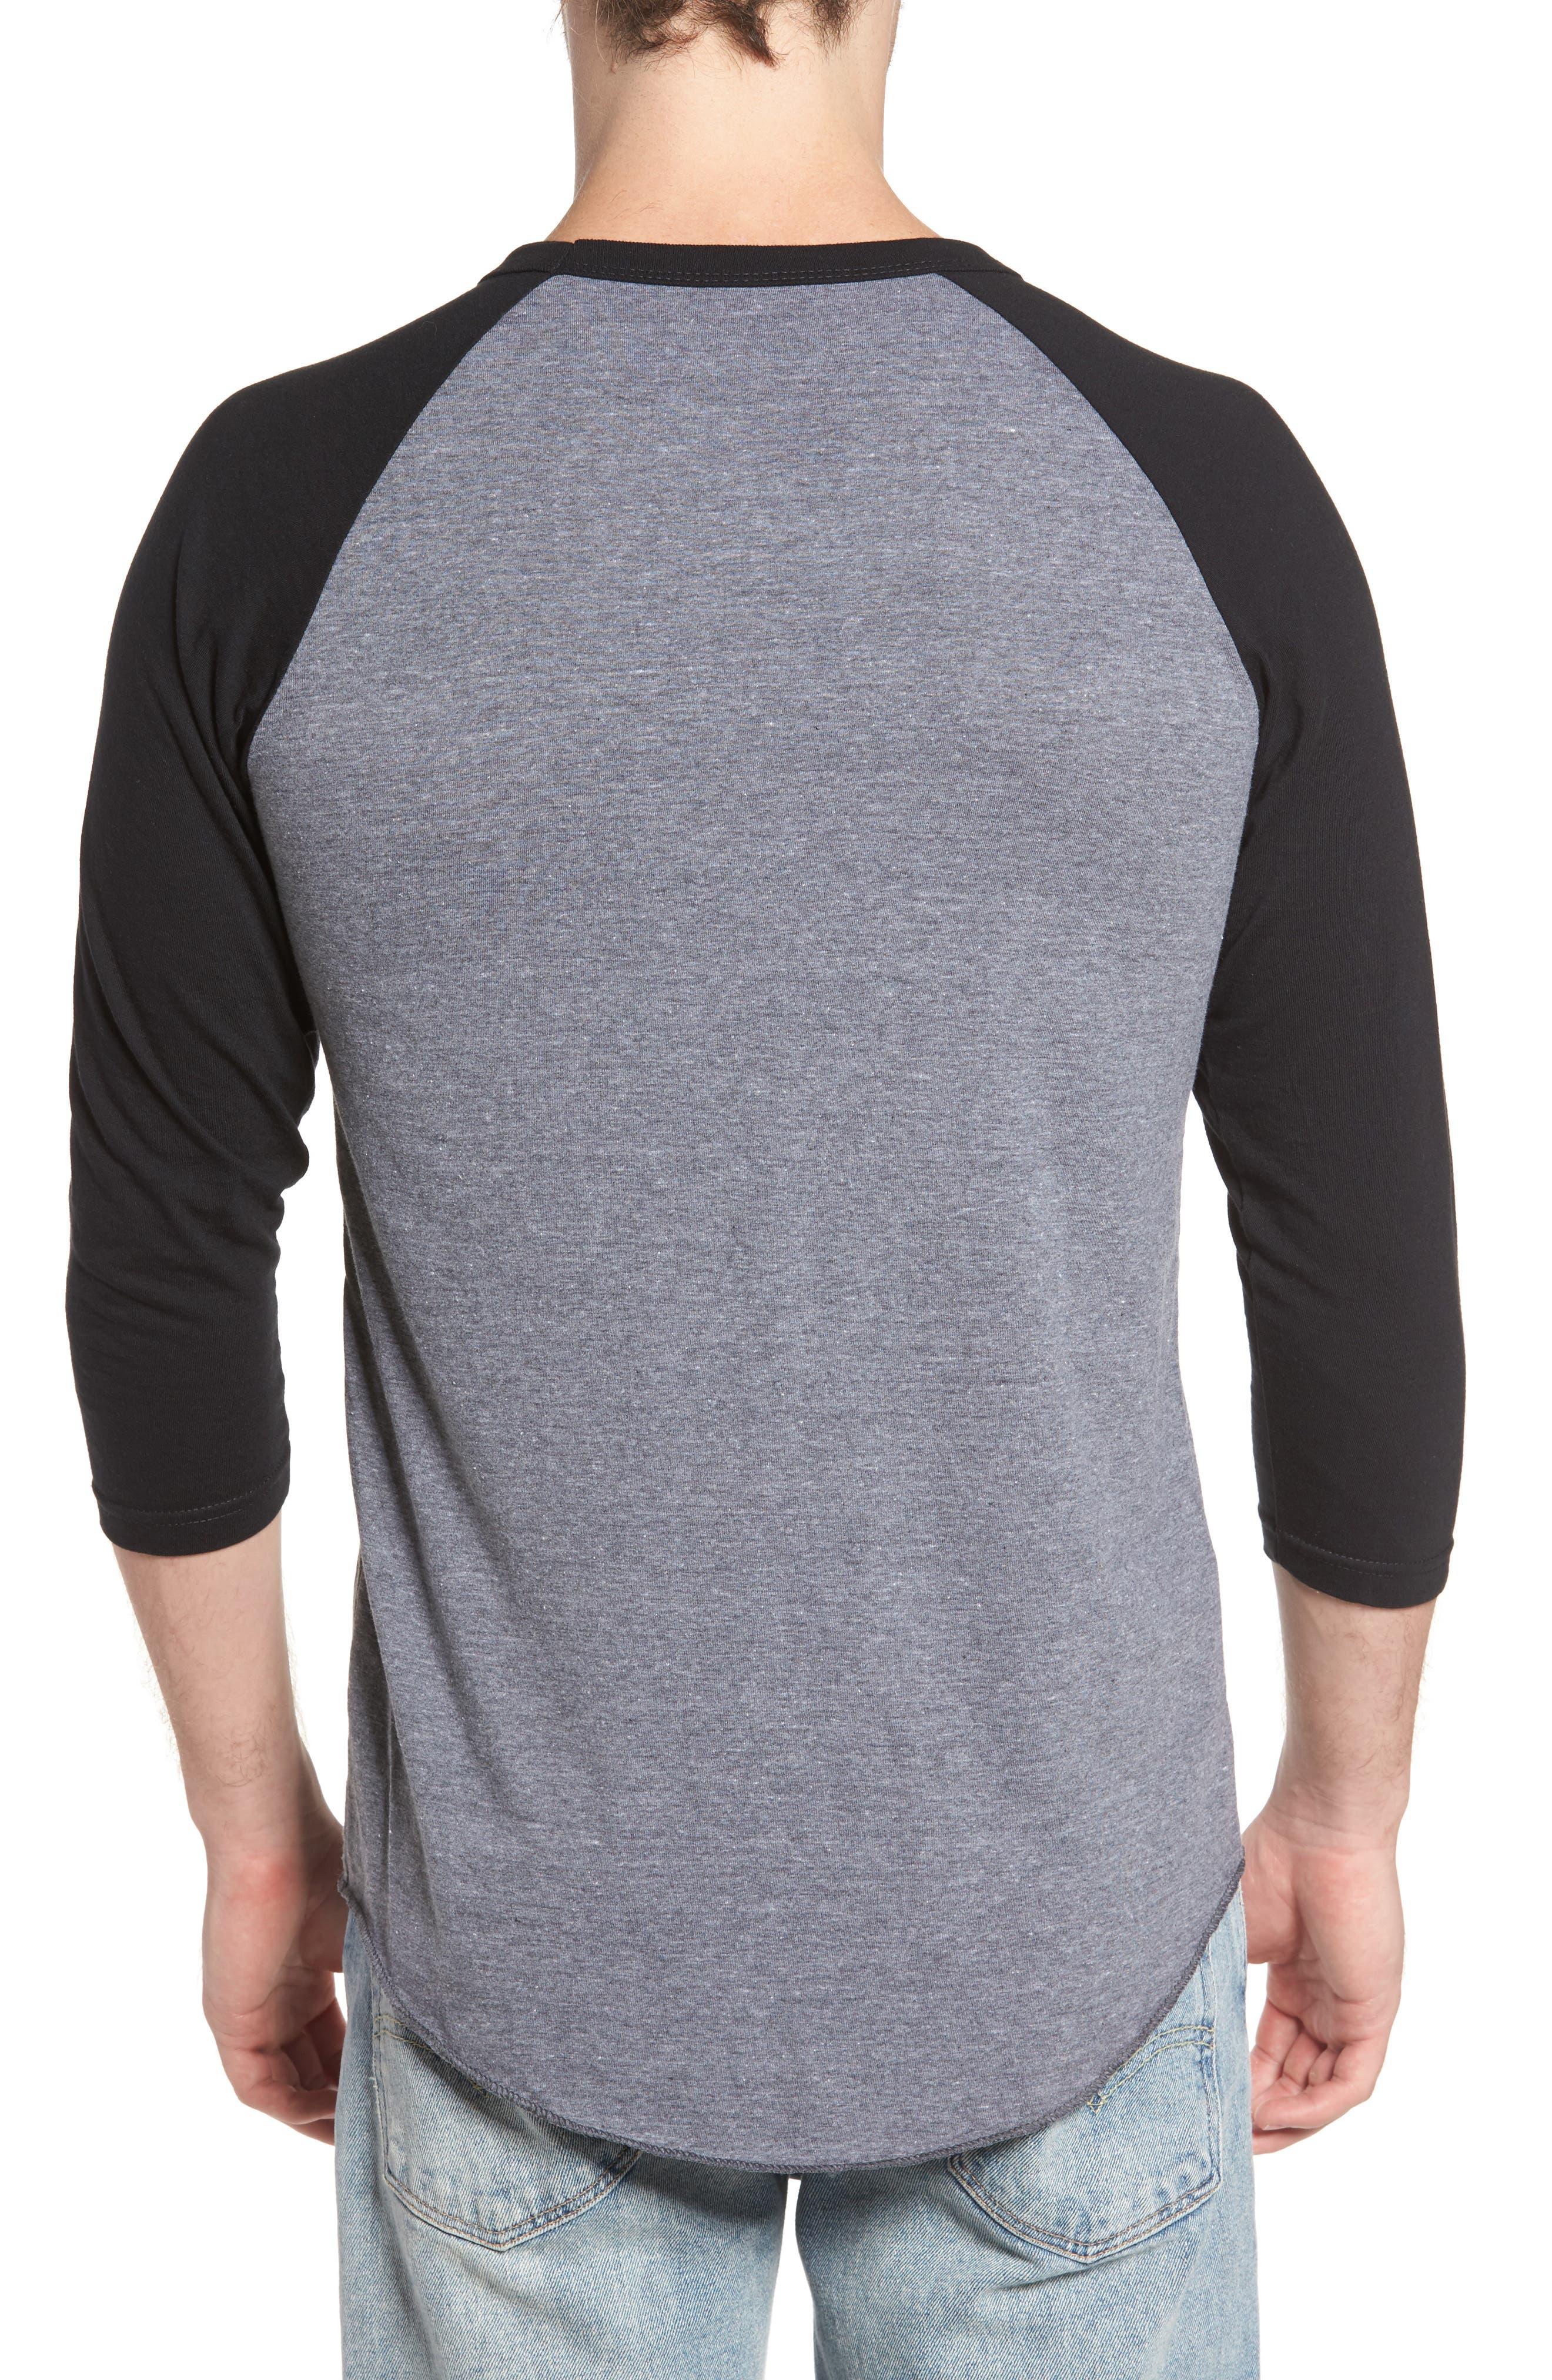 Planer Raglan T-Shirt,                             Alternate thumbnail 2, color,                             Grey W/ Black